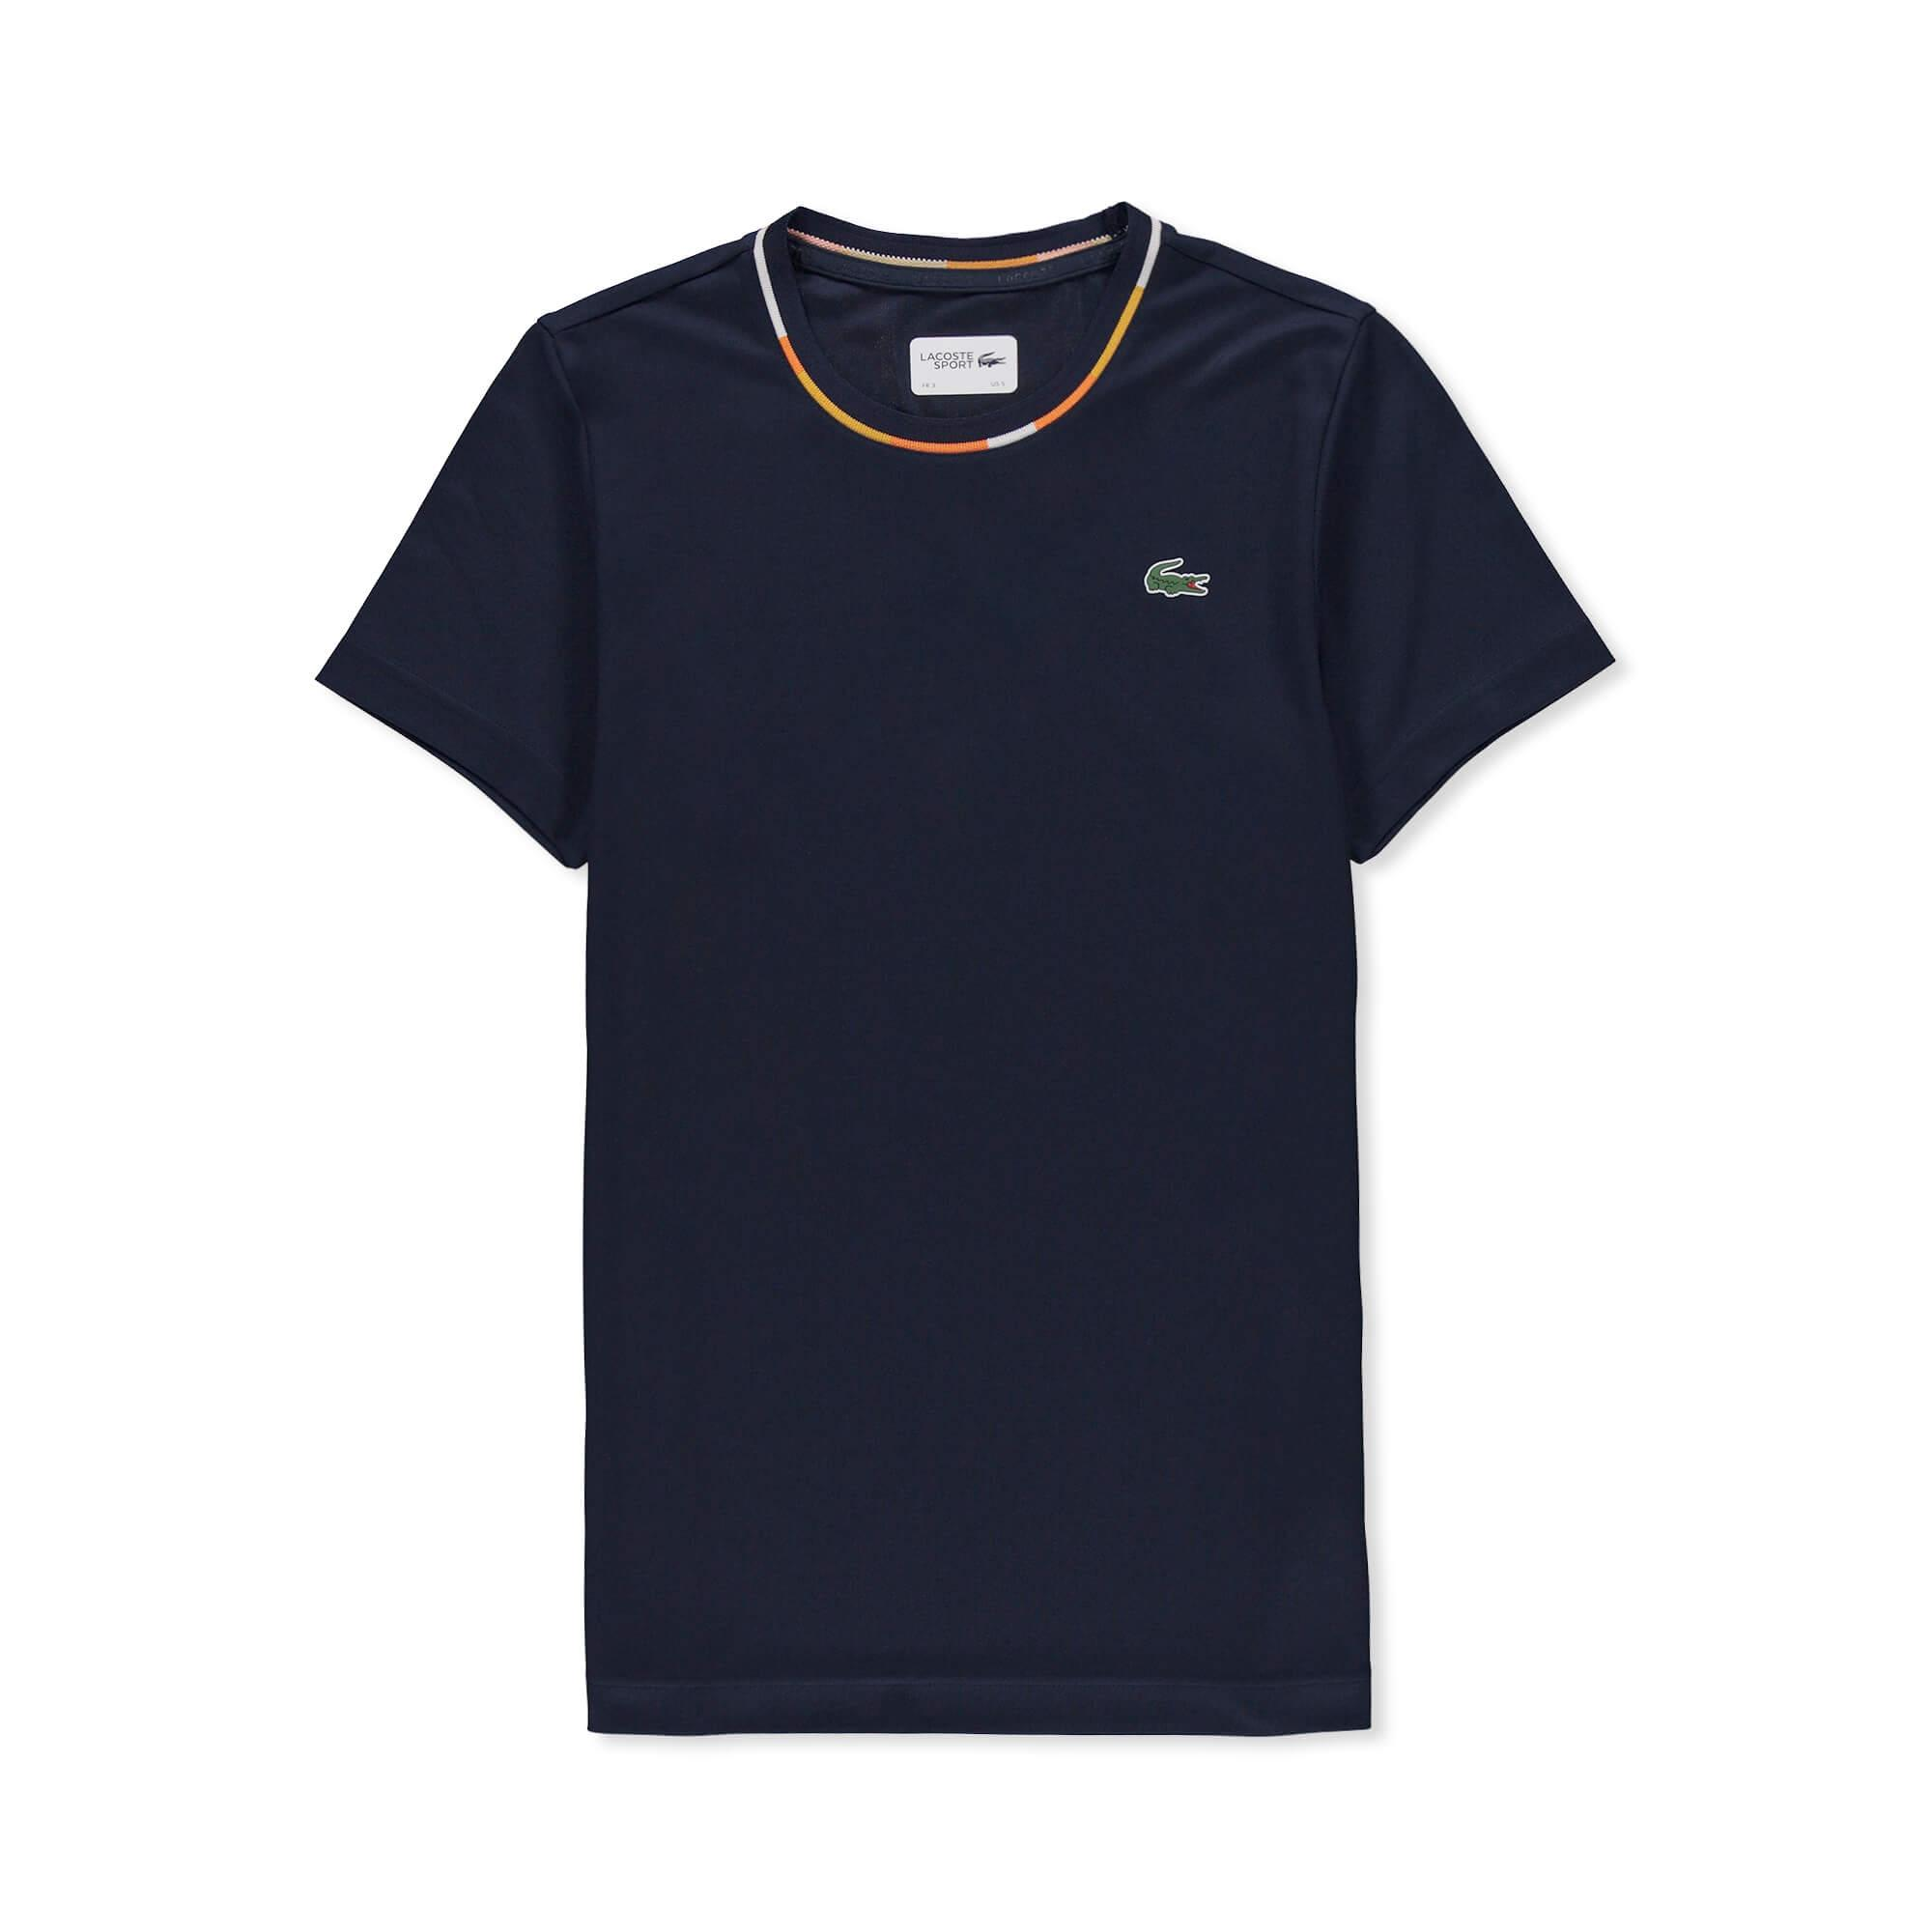 Lacoste Erkek Spor Lacivert T-Shirt